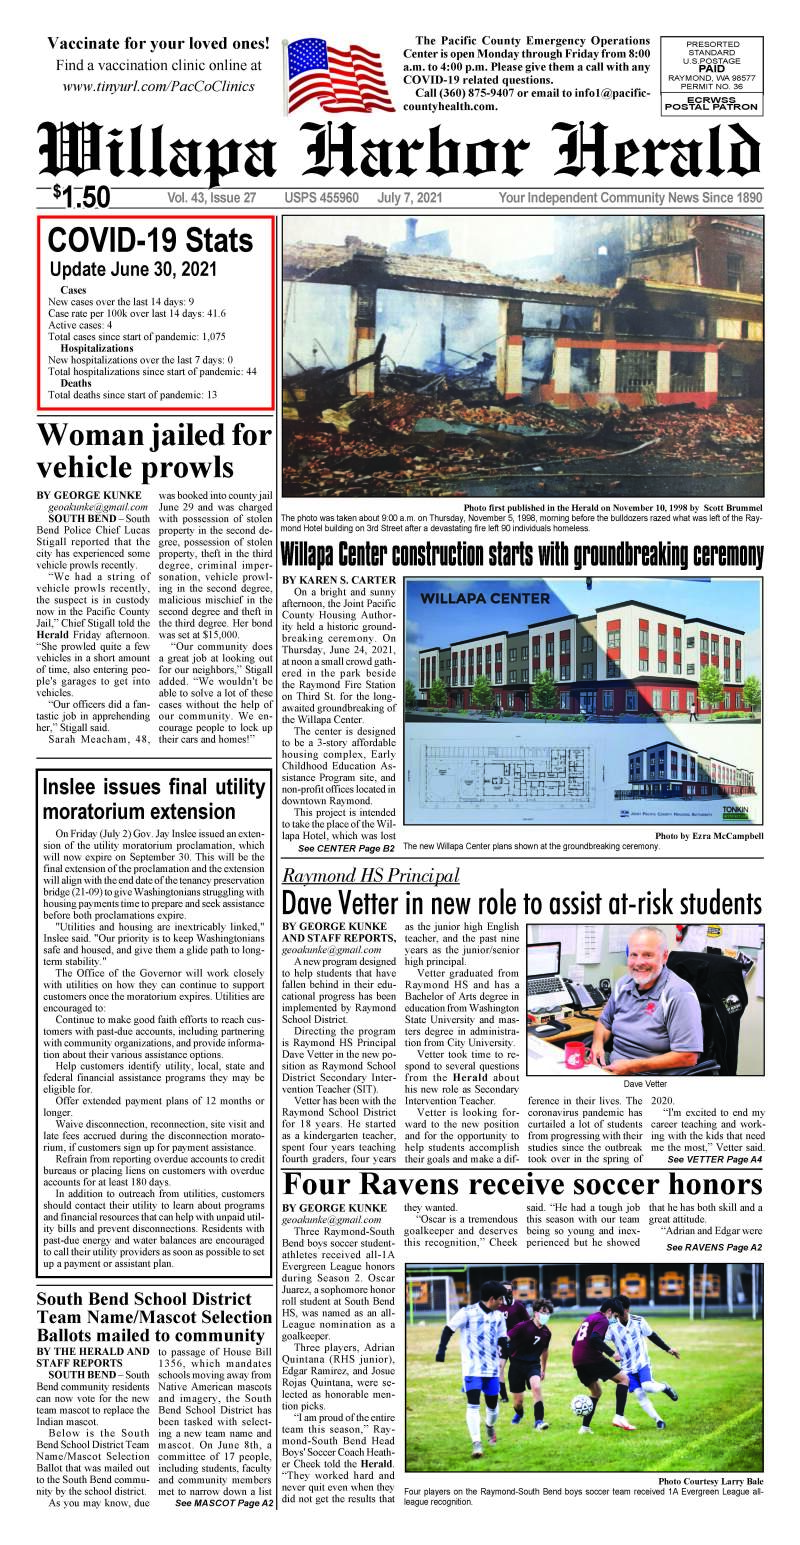 Jul 7, 2021 Willapa Harbor Herald and Pacific County Press